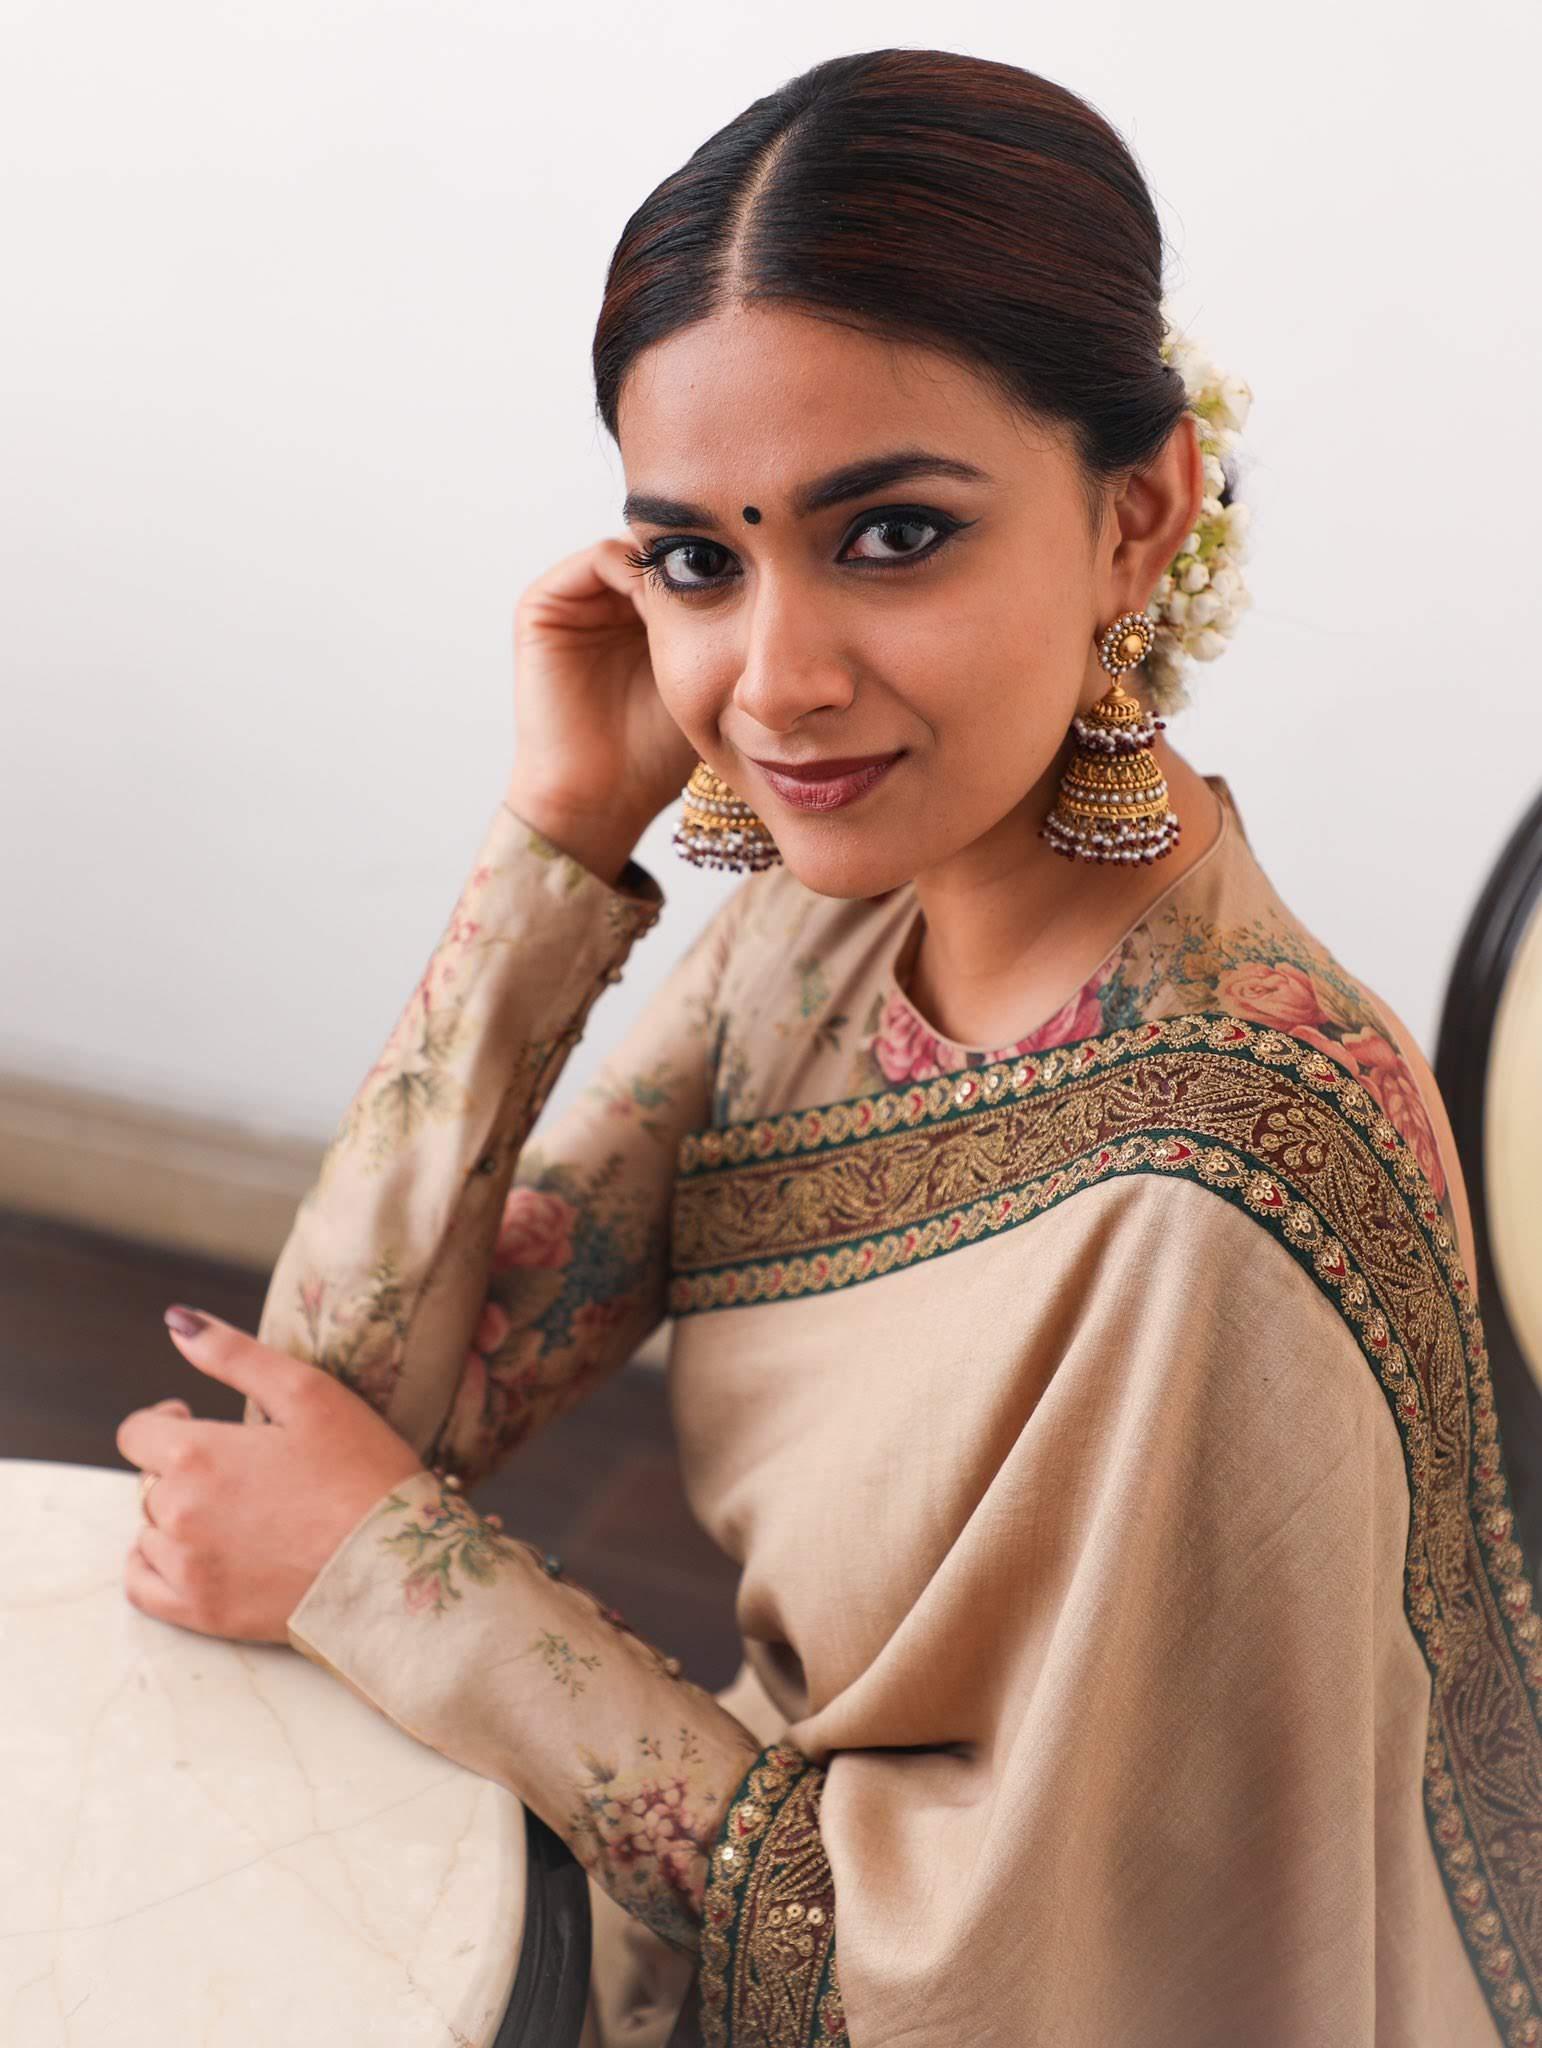 Keerthi-Suresh-Images-HD-22